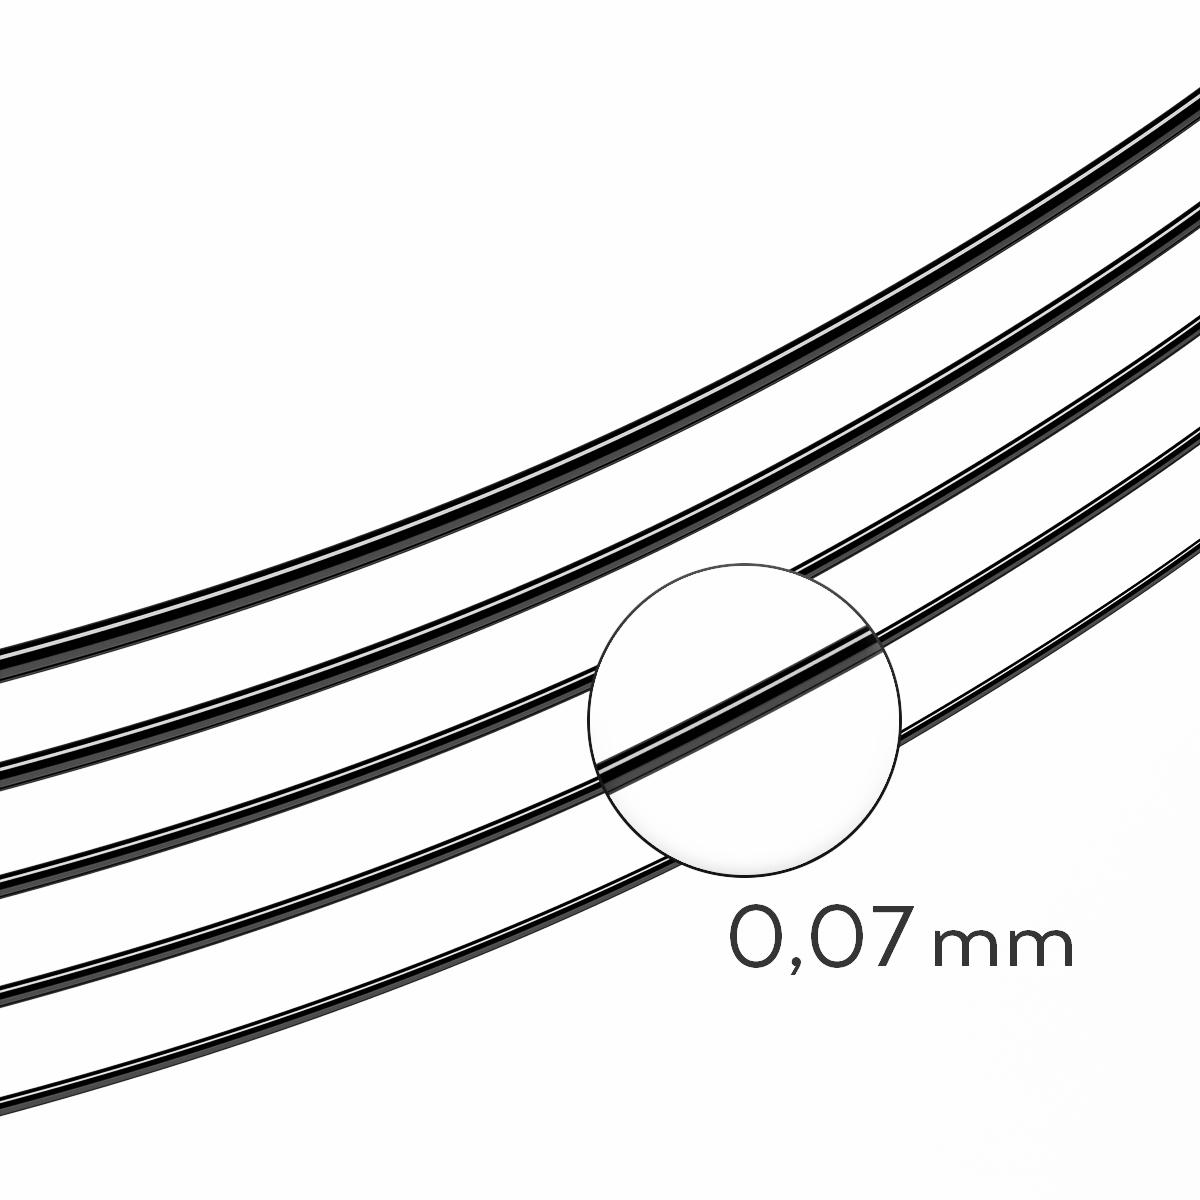 rzesy-objetosciowe-silk-black-l-0-07